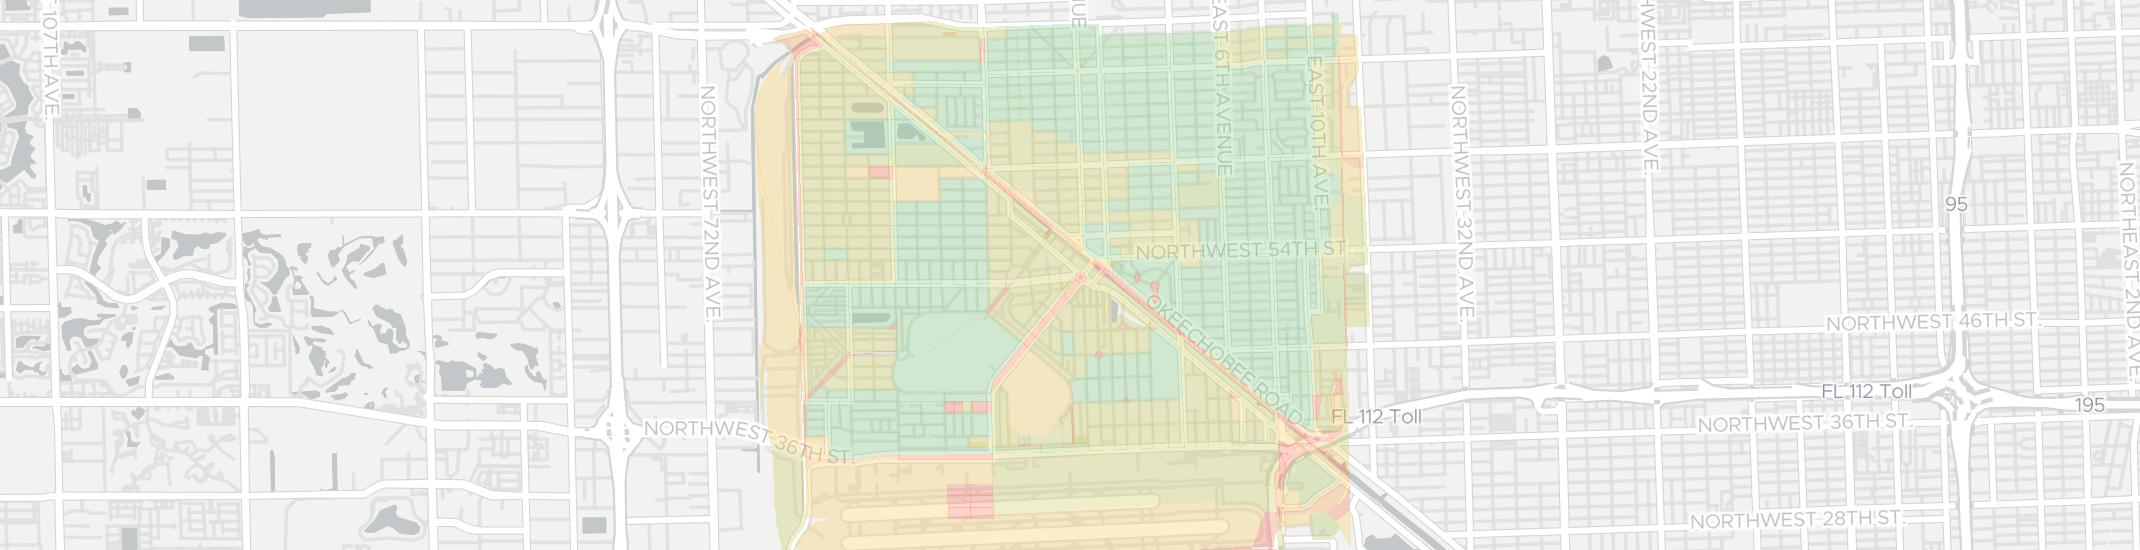 Miami Springs Florida Map.Internet Providers In Miami Springs Fl Compare 12 Providers